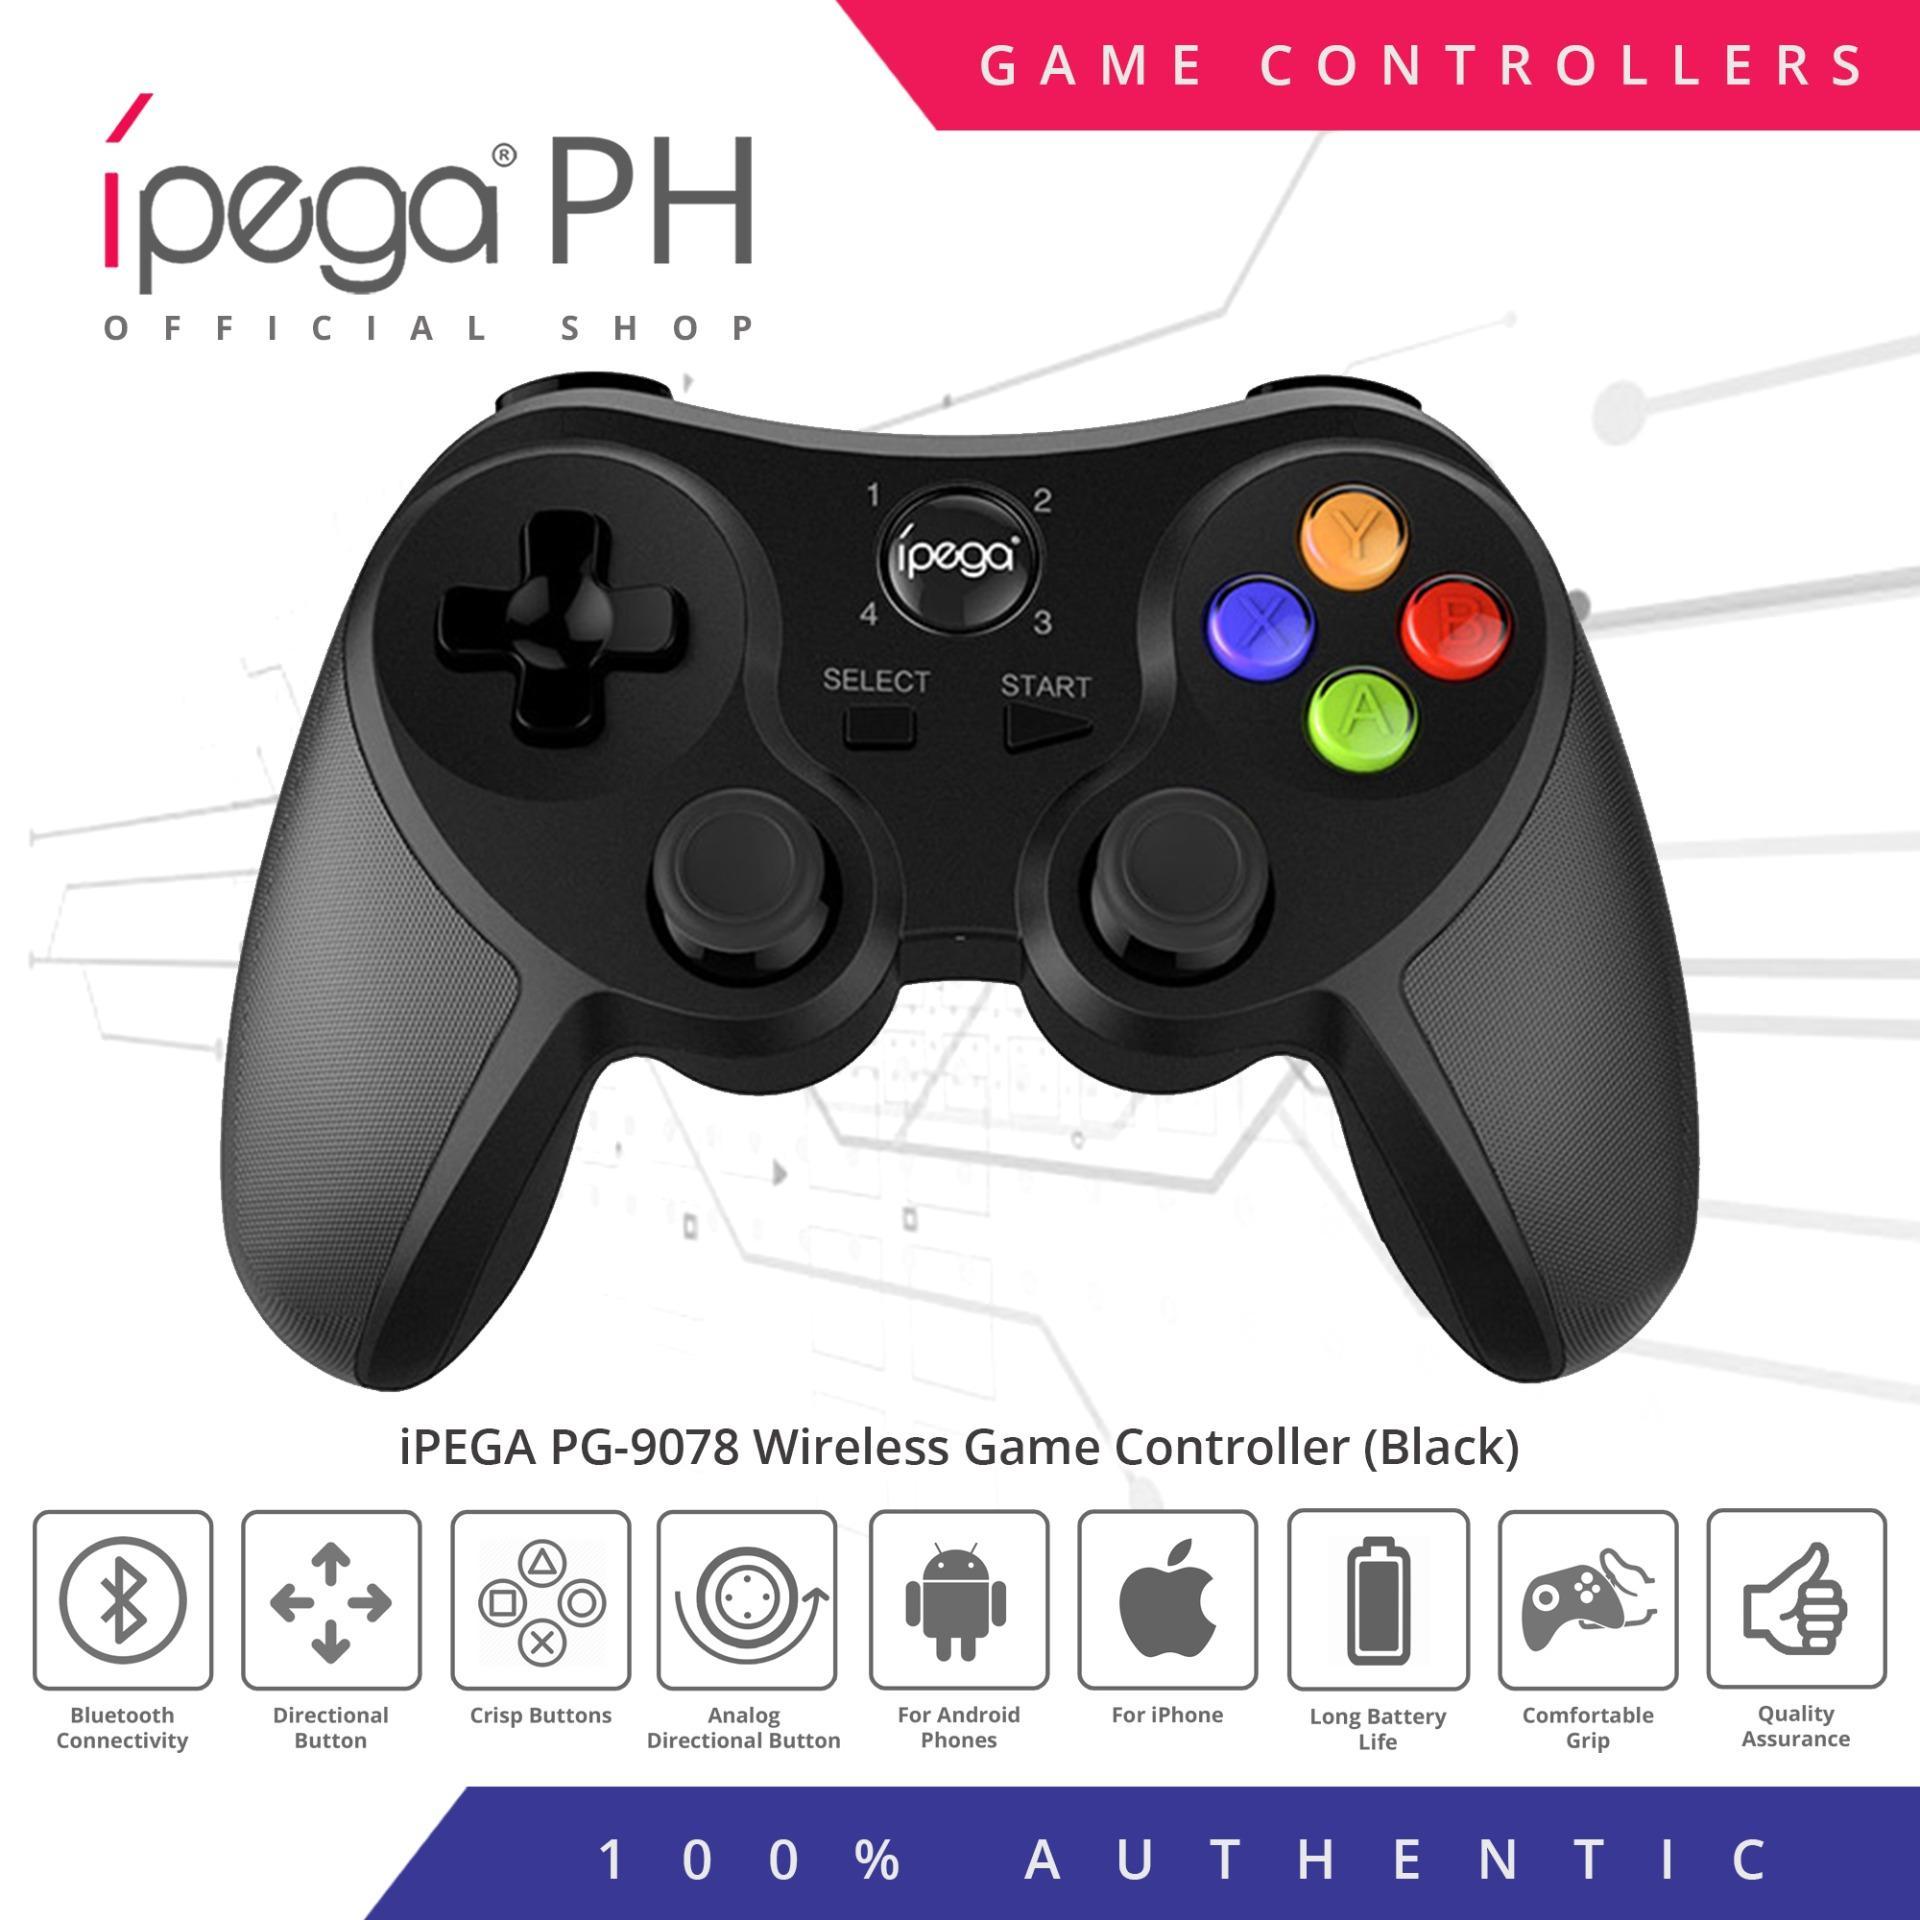 Ipega Pg-9078 Wireless Game Controller By Ipega.